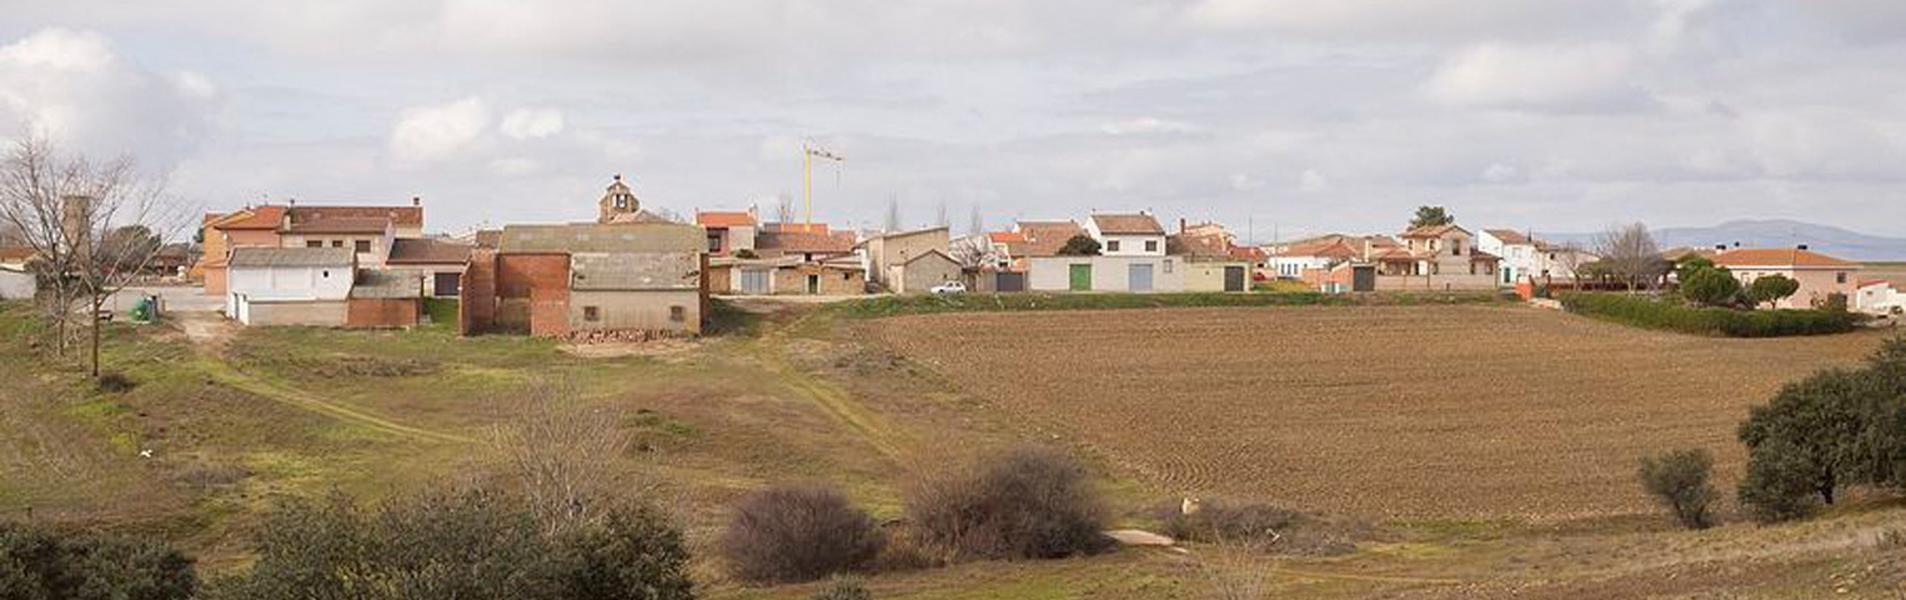 Villaseca de Uceda